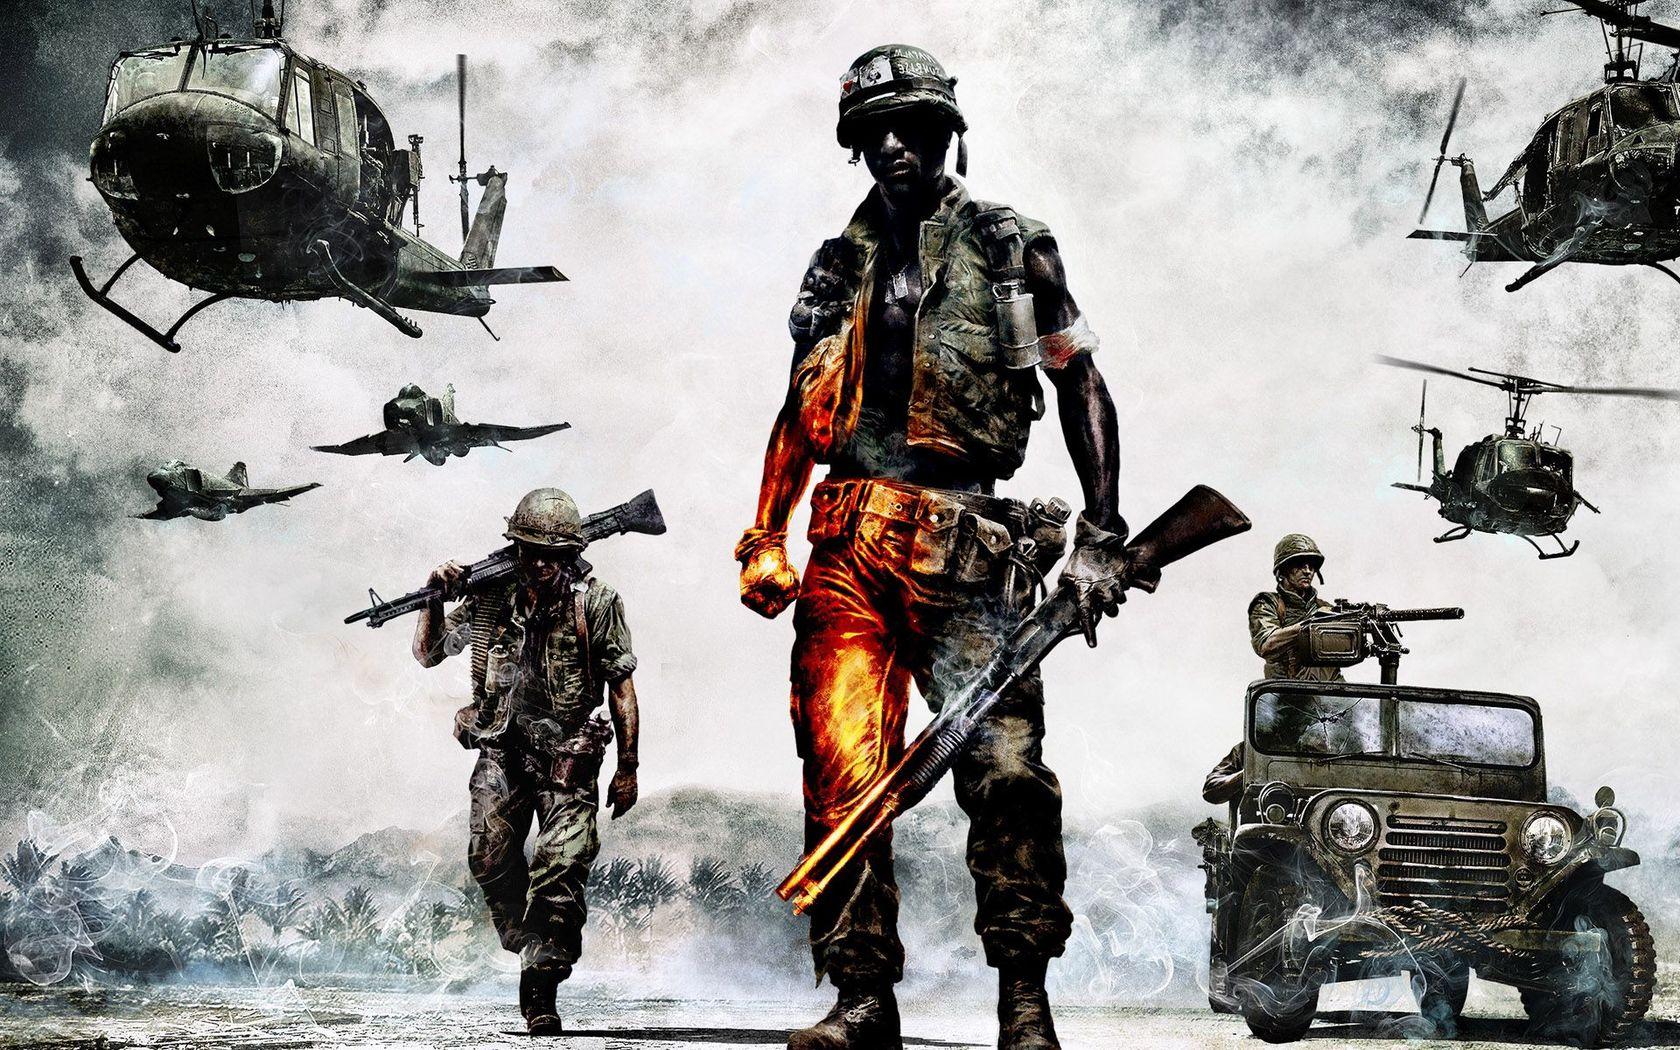 Download Battlefield   Bad Company 2 wallpaper 1680x1050